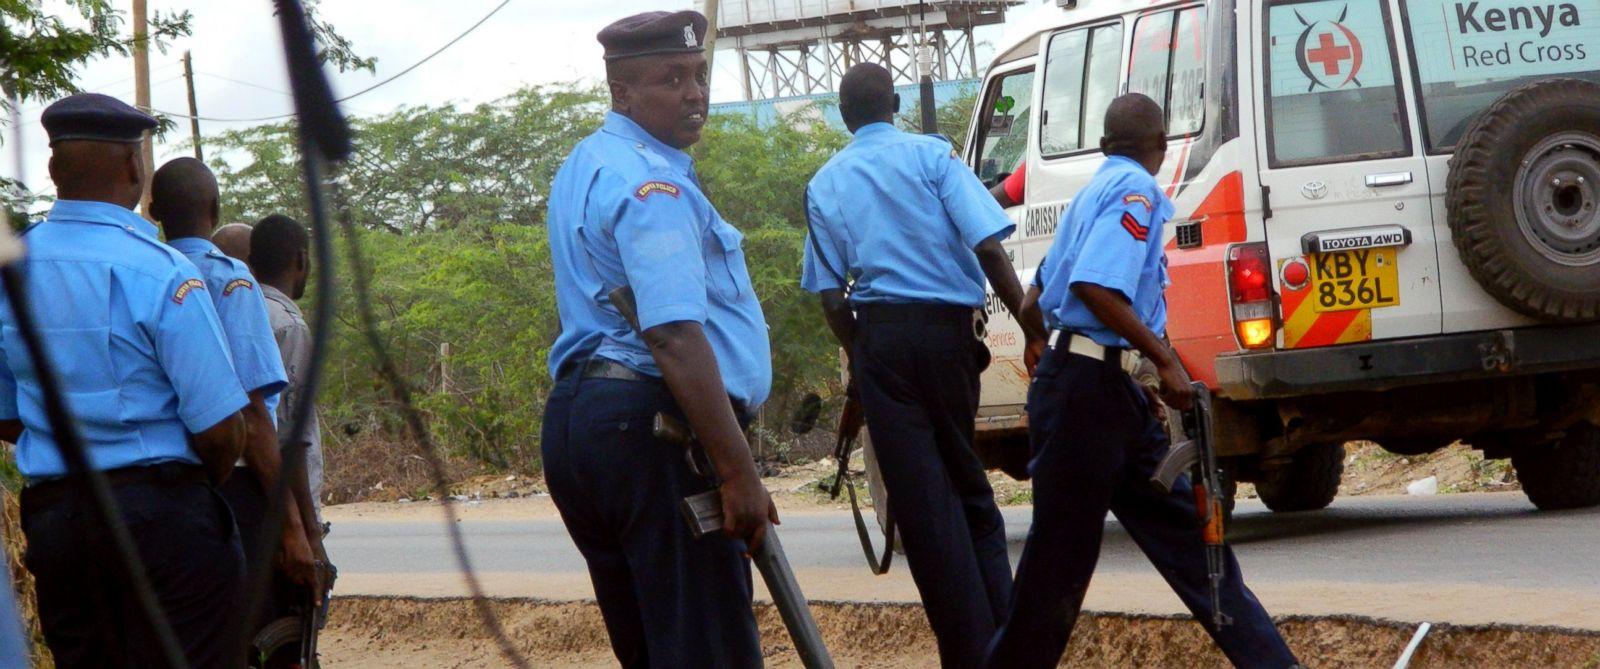 Kenya: 147 Killed in University Attack, Officials Say ...